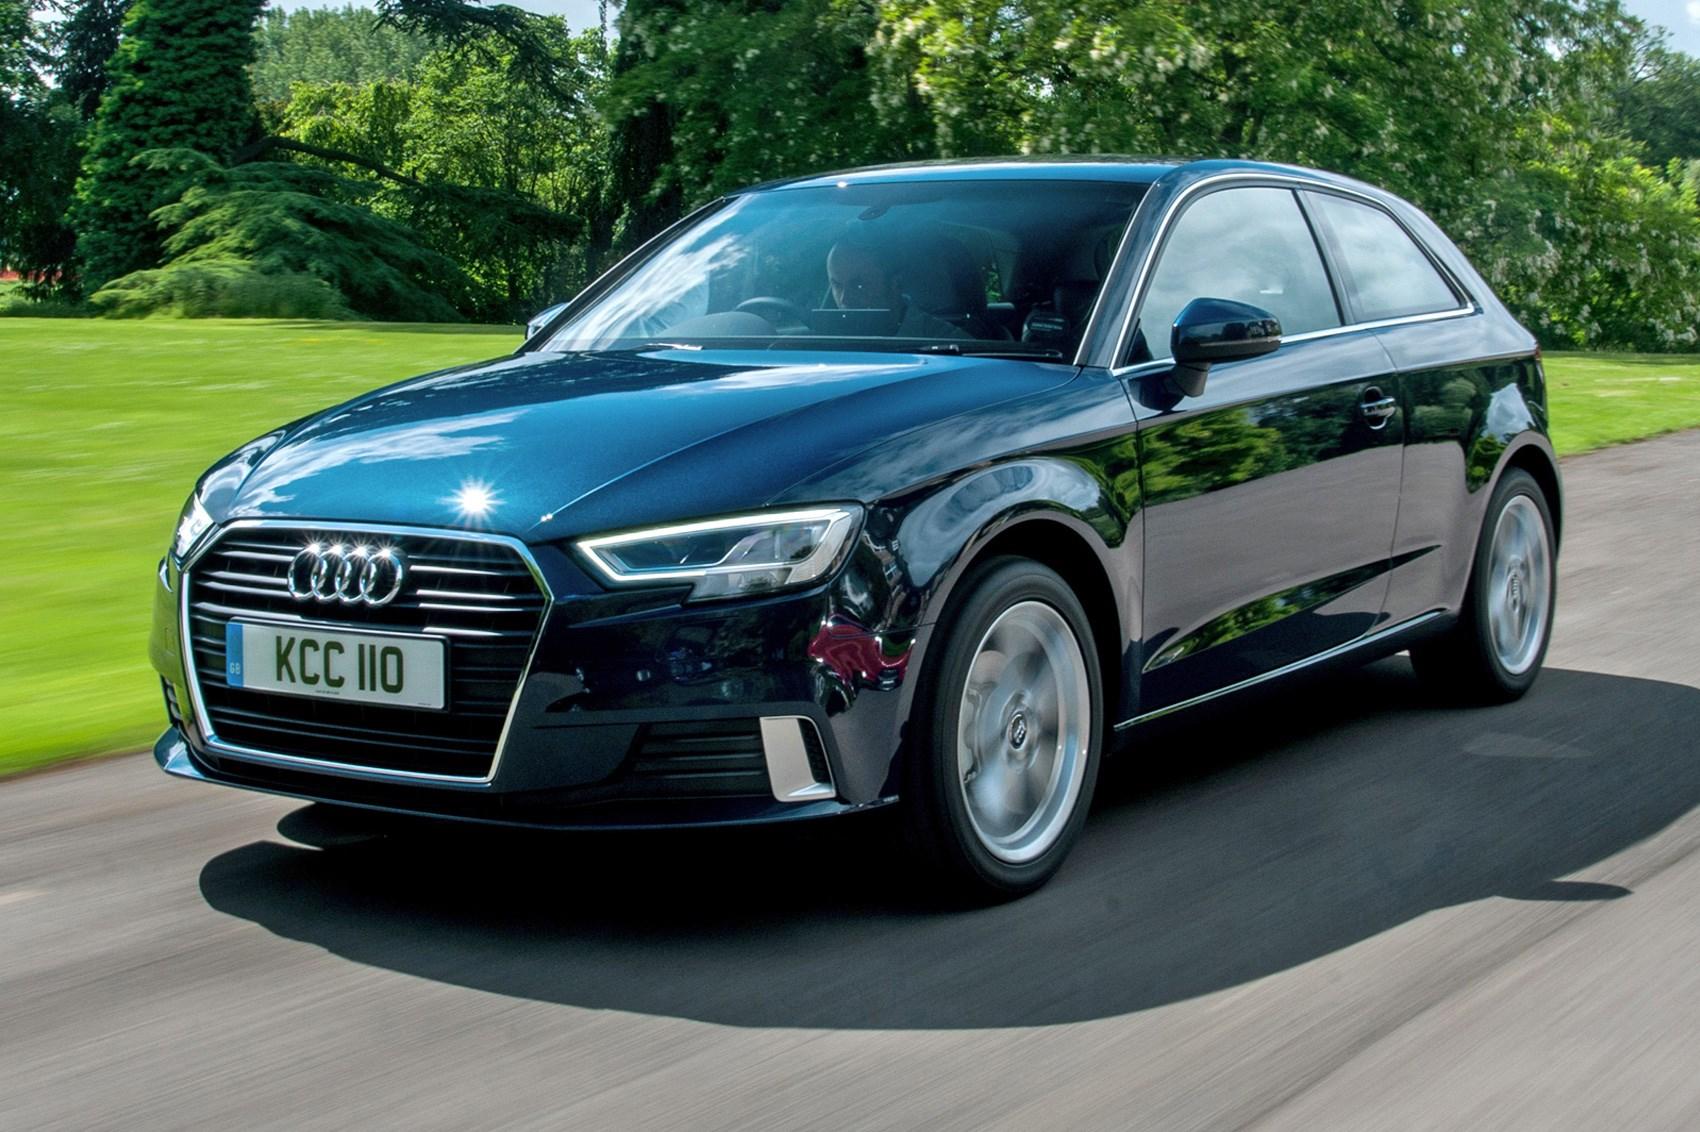 Audi a3 2016 review